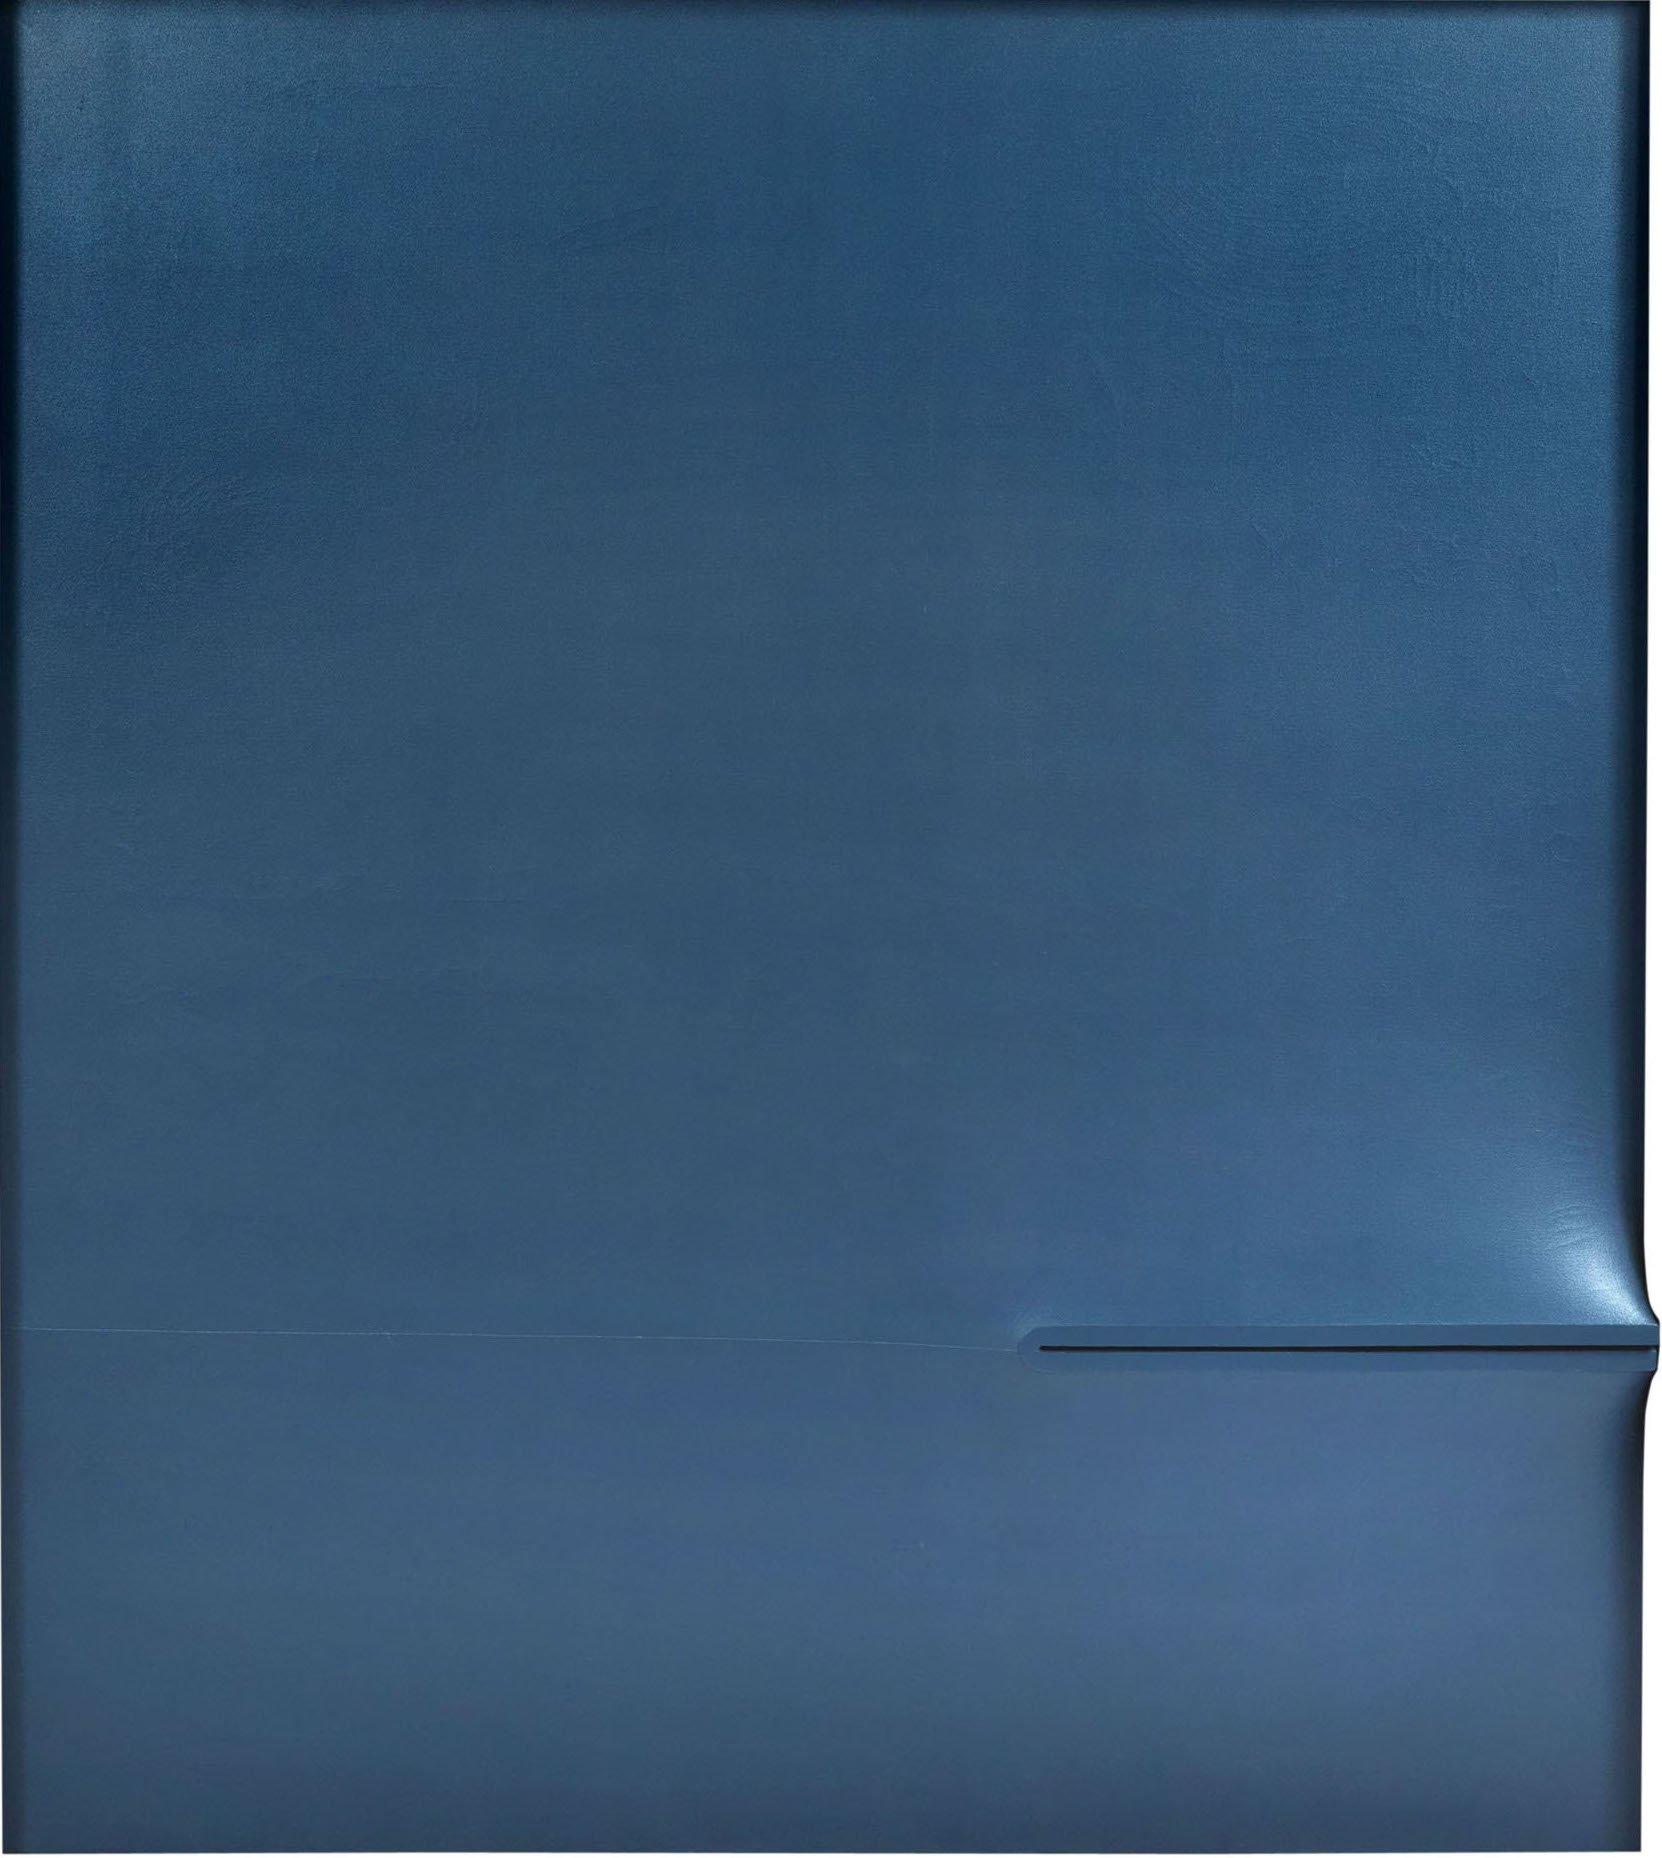 Agostino Bonalumi, Blu, 1972, tempera a base di vinile su tela sagomata, 180x160 cm